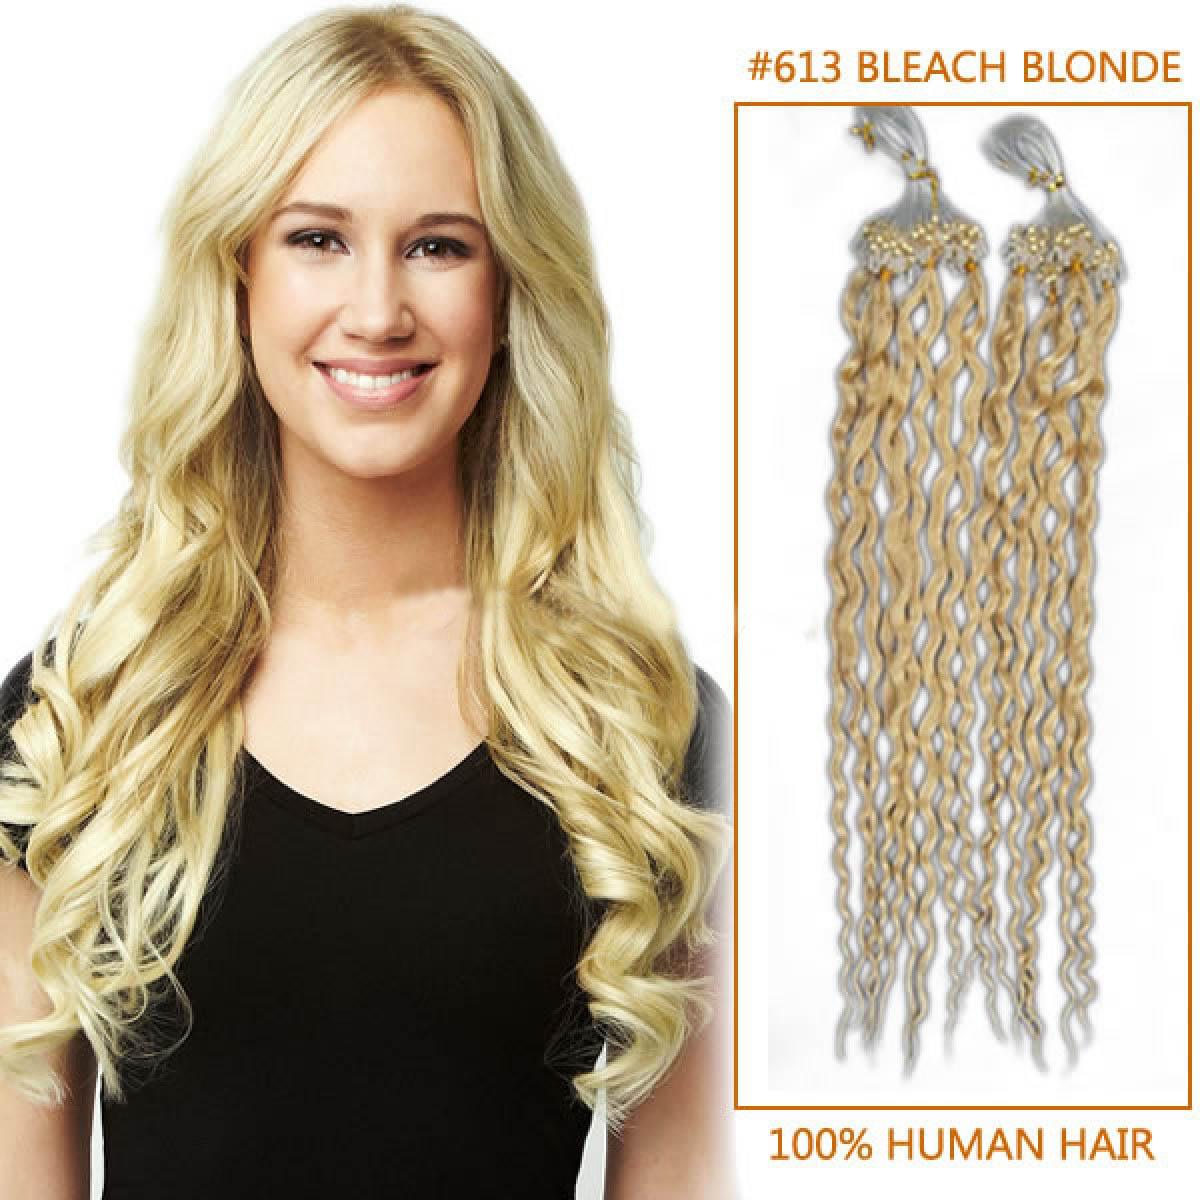 24 Inch 613 Bleach Blonde Hot Curly Micro Loop Hair Extensions 100